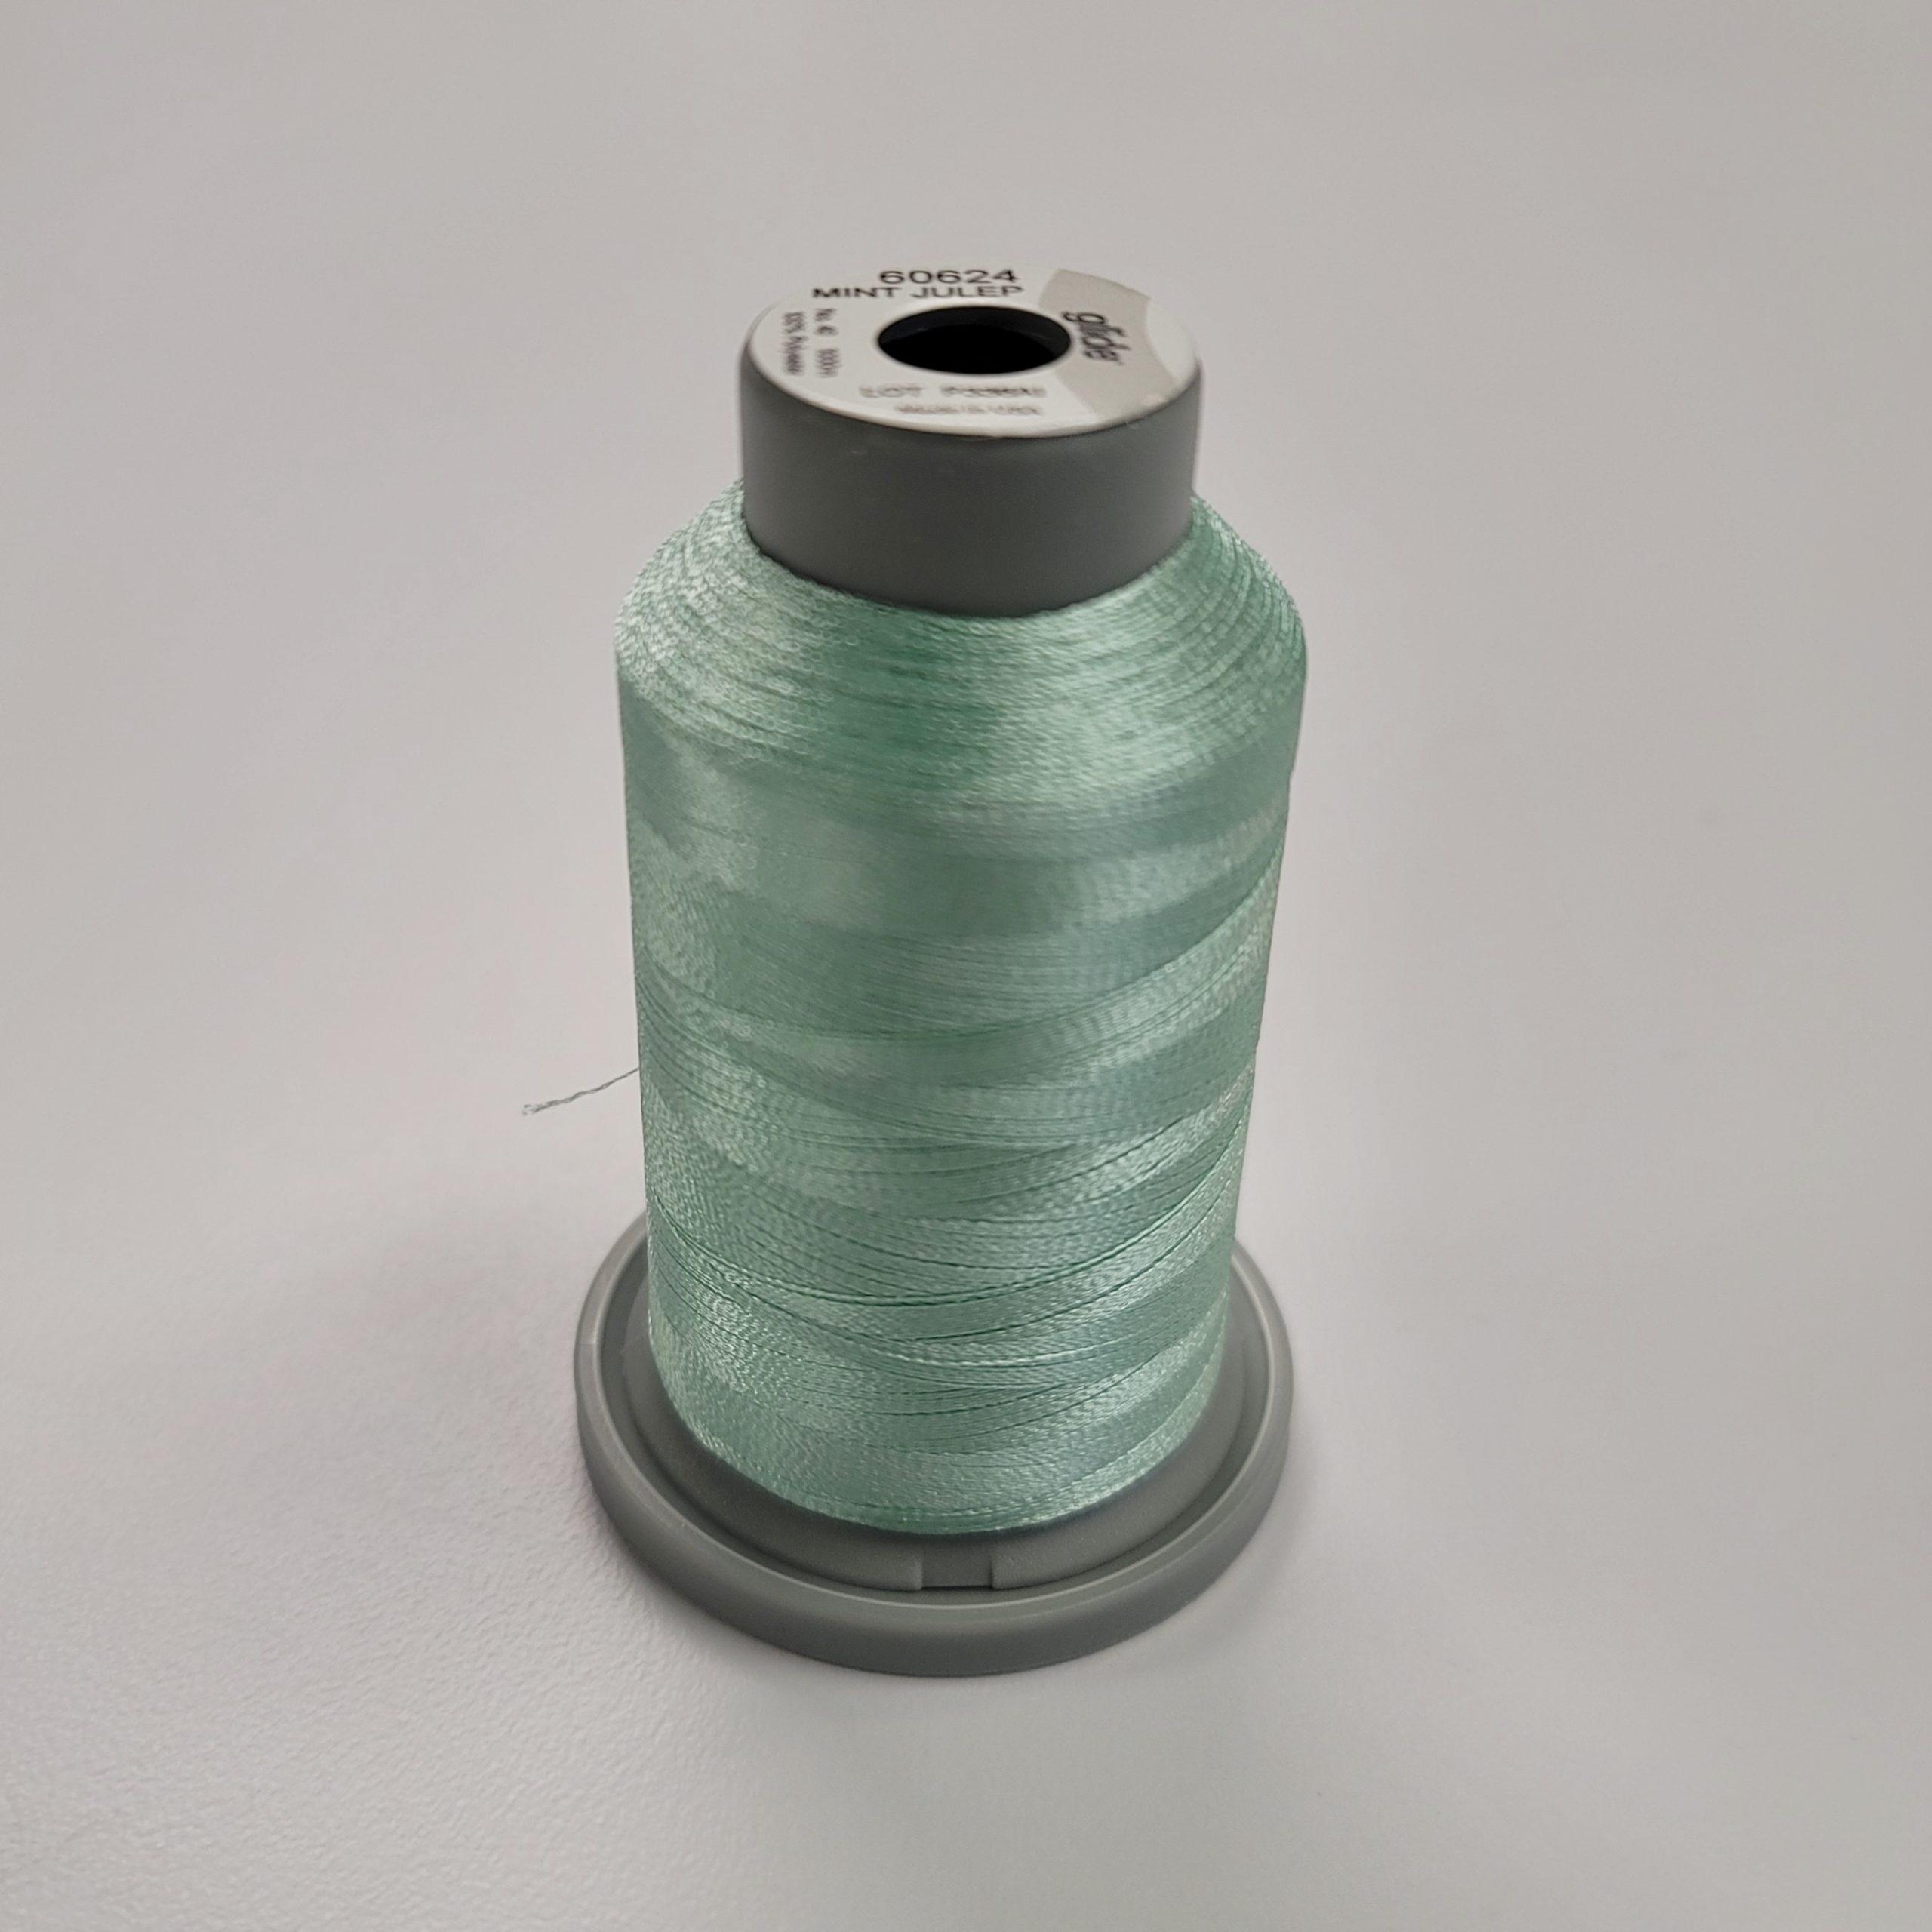 mint julep glide thread